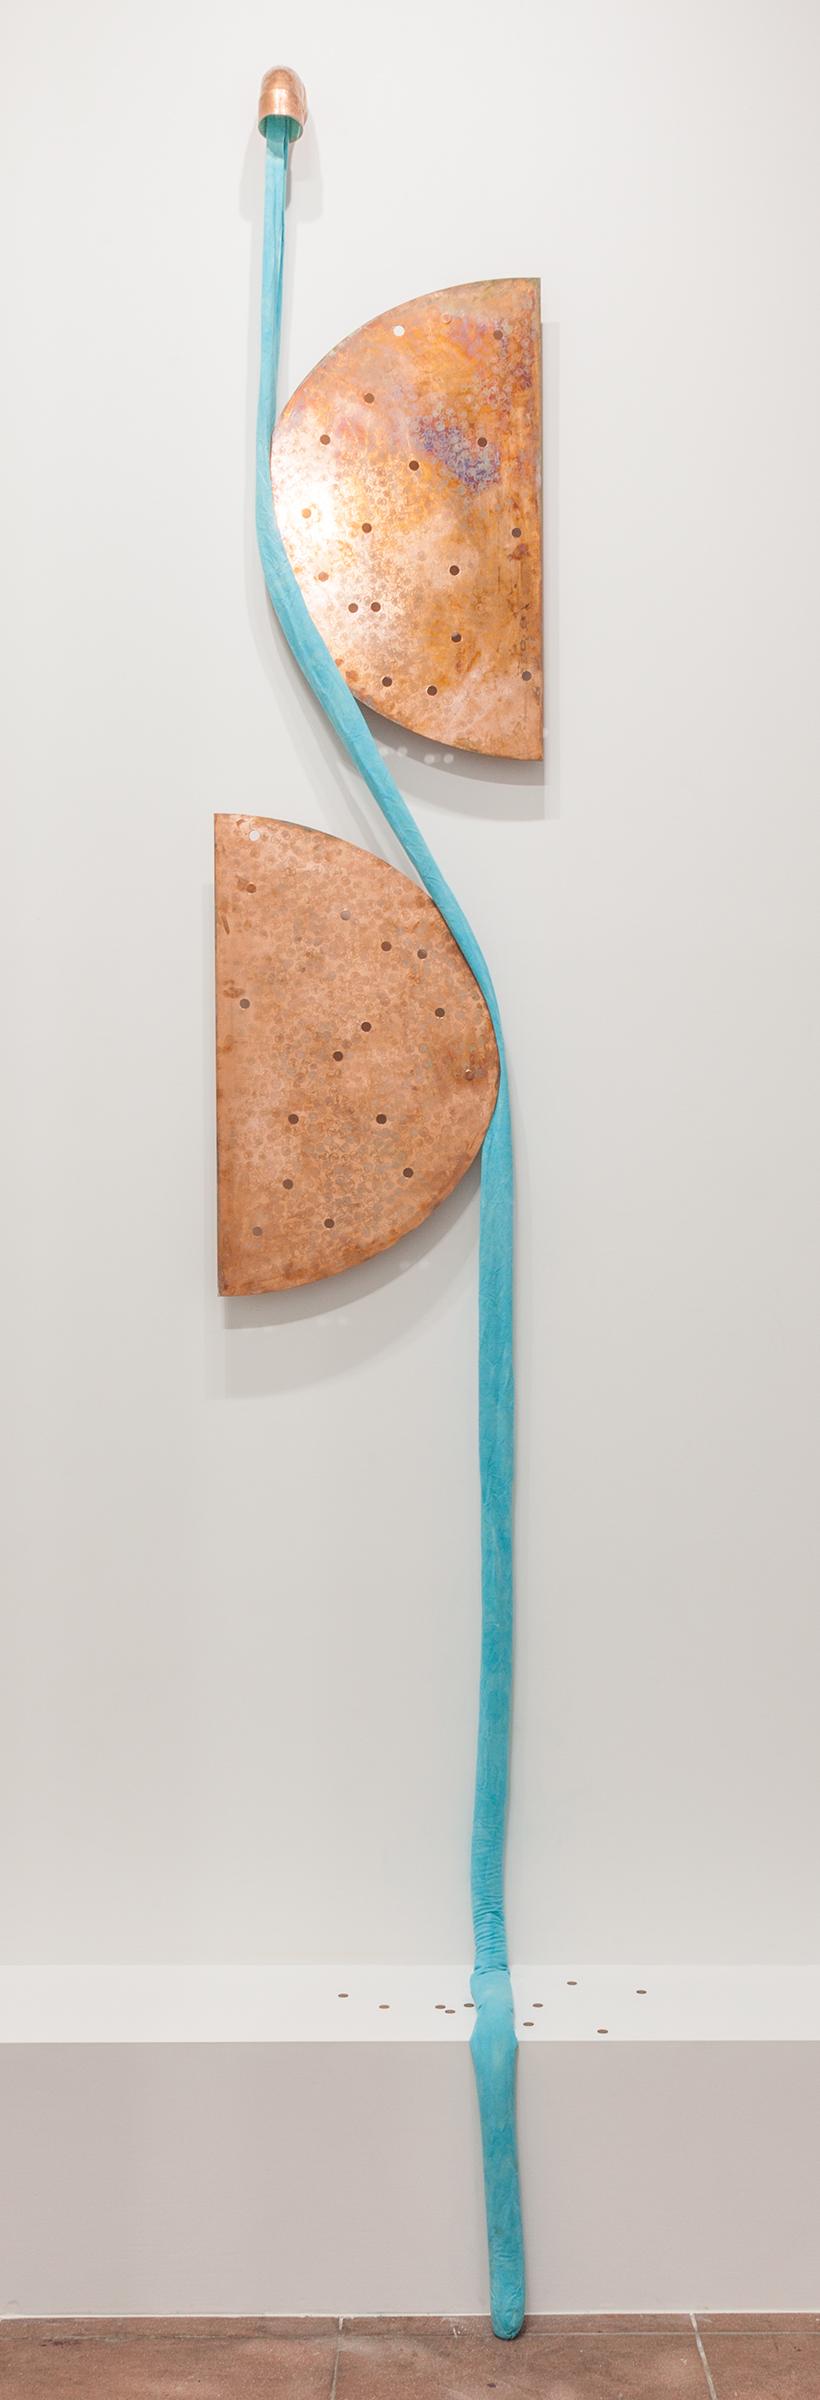 Jory Rabinovitz,  EBB3 (B2)  , 2014,melted pennies, pennies, Verdigris, fabric, rain water,dimensions variable